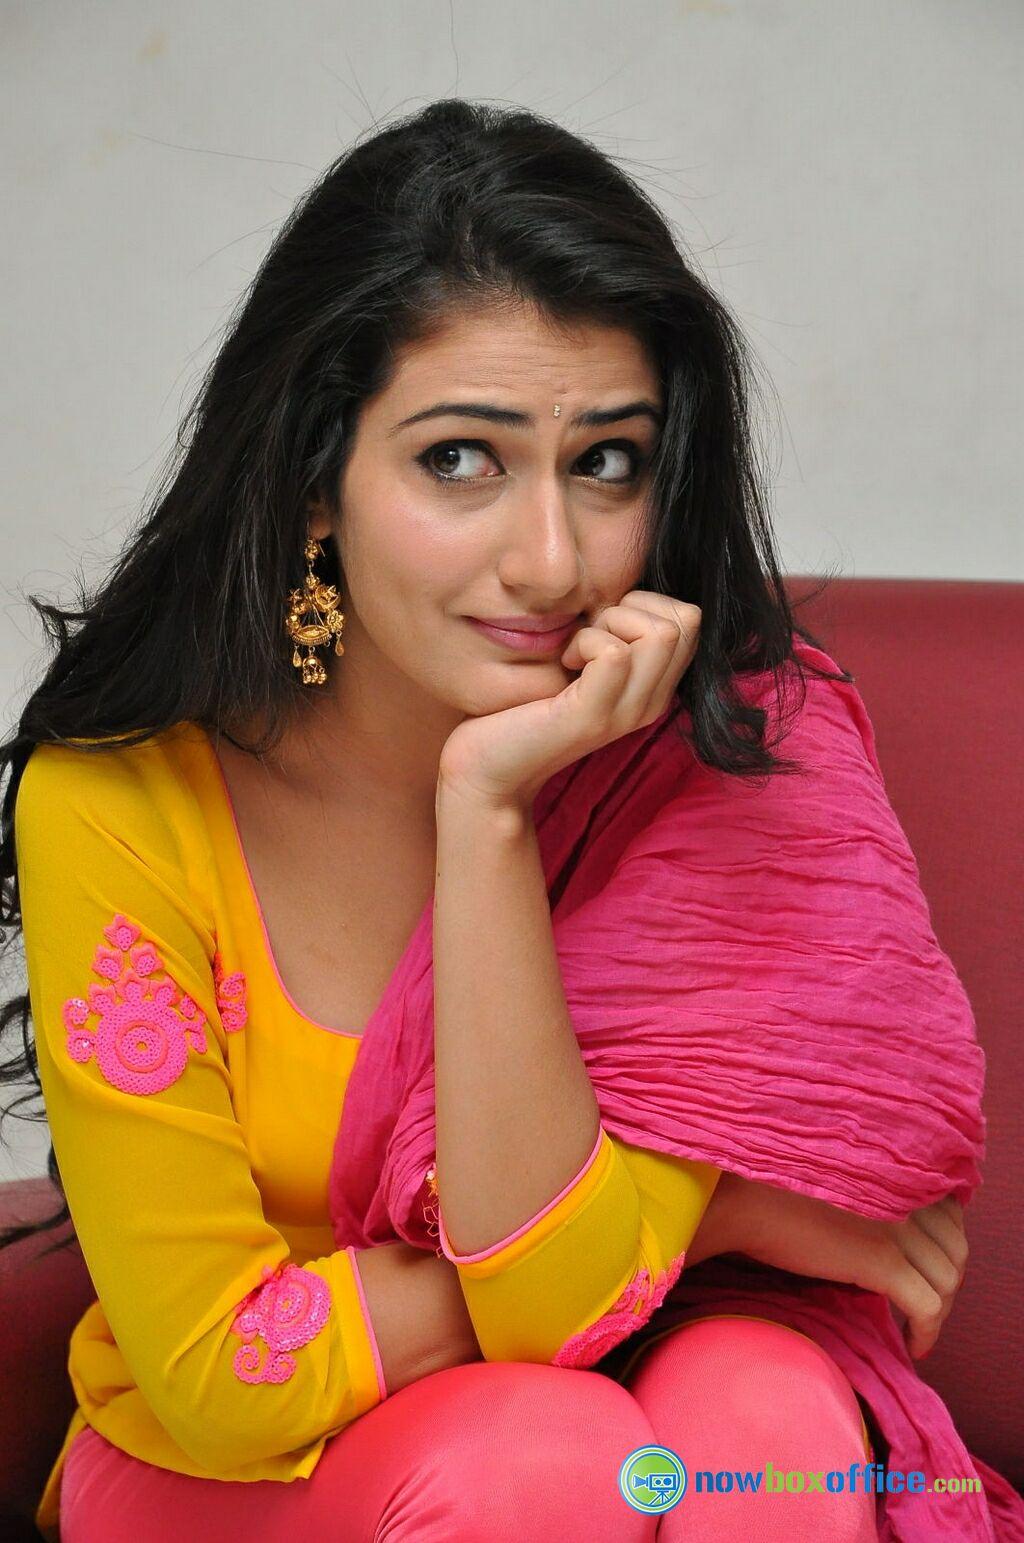 Amma Ni Akka Ni Maradalini Kalipi Dengamu Part 2  Telugu -8980